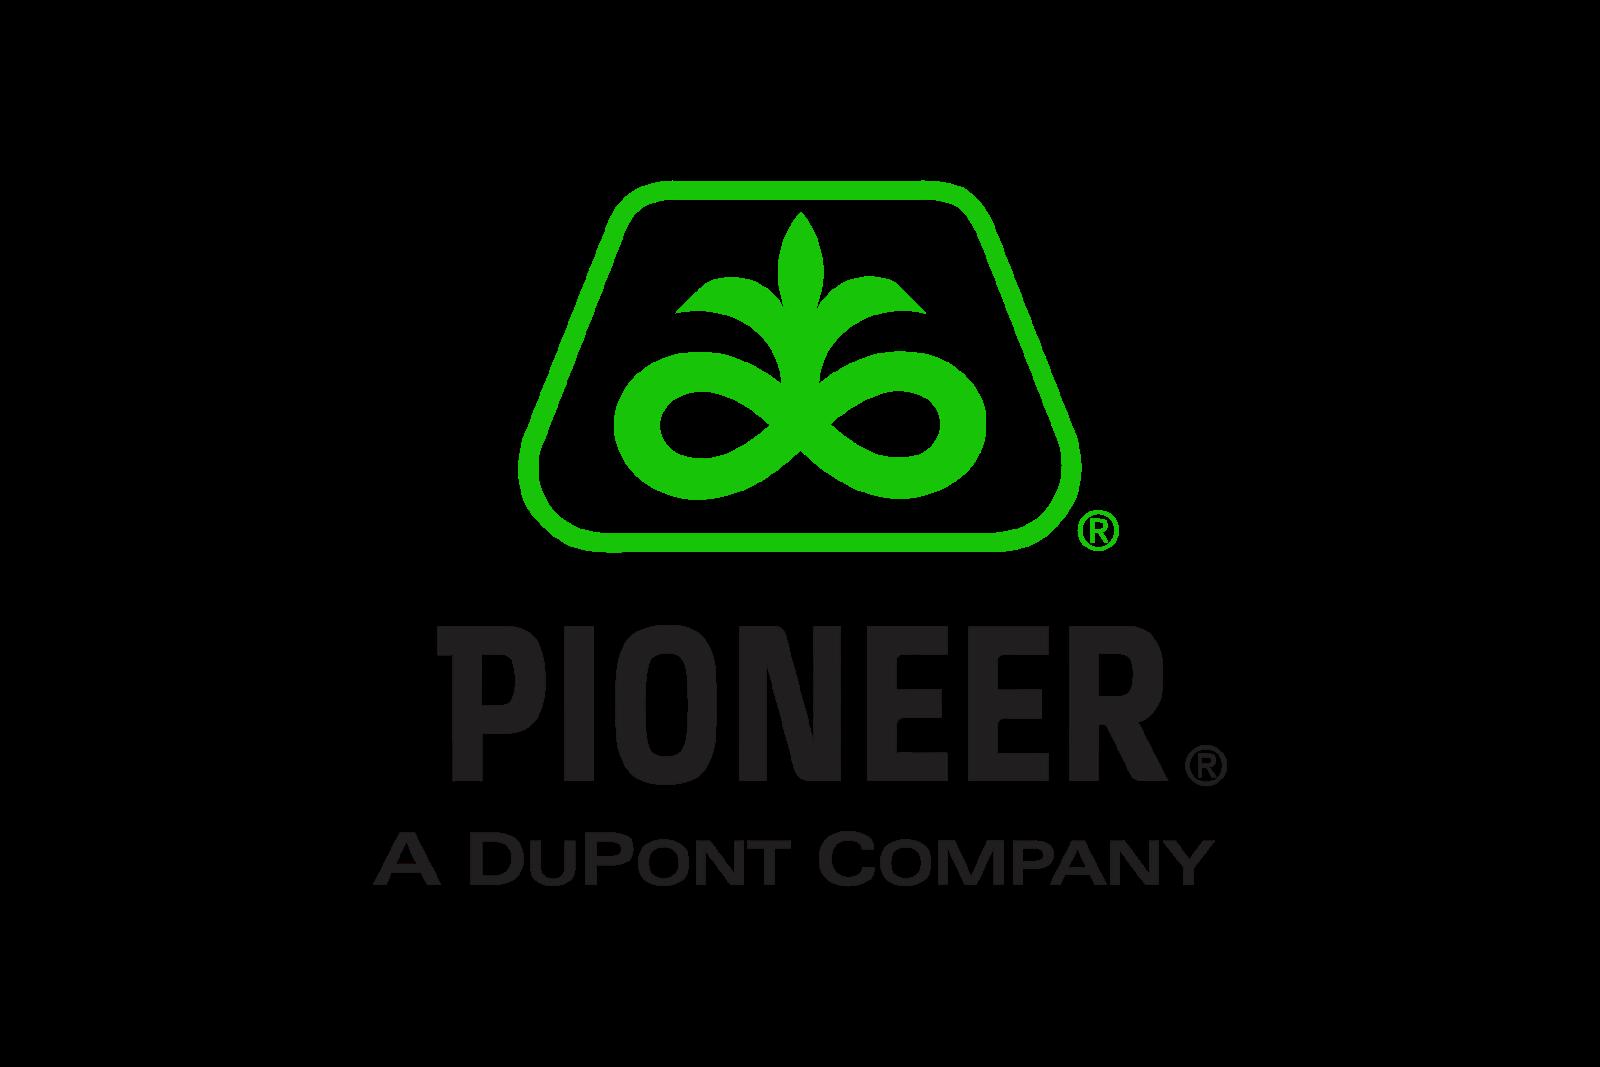 DuPont Pioneer Logo - logo cdr vector  DuPont Pioneer ...